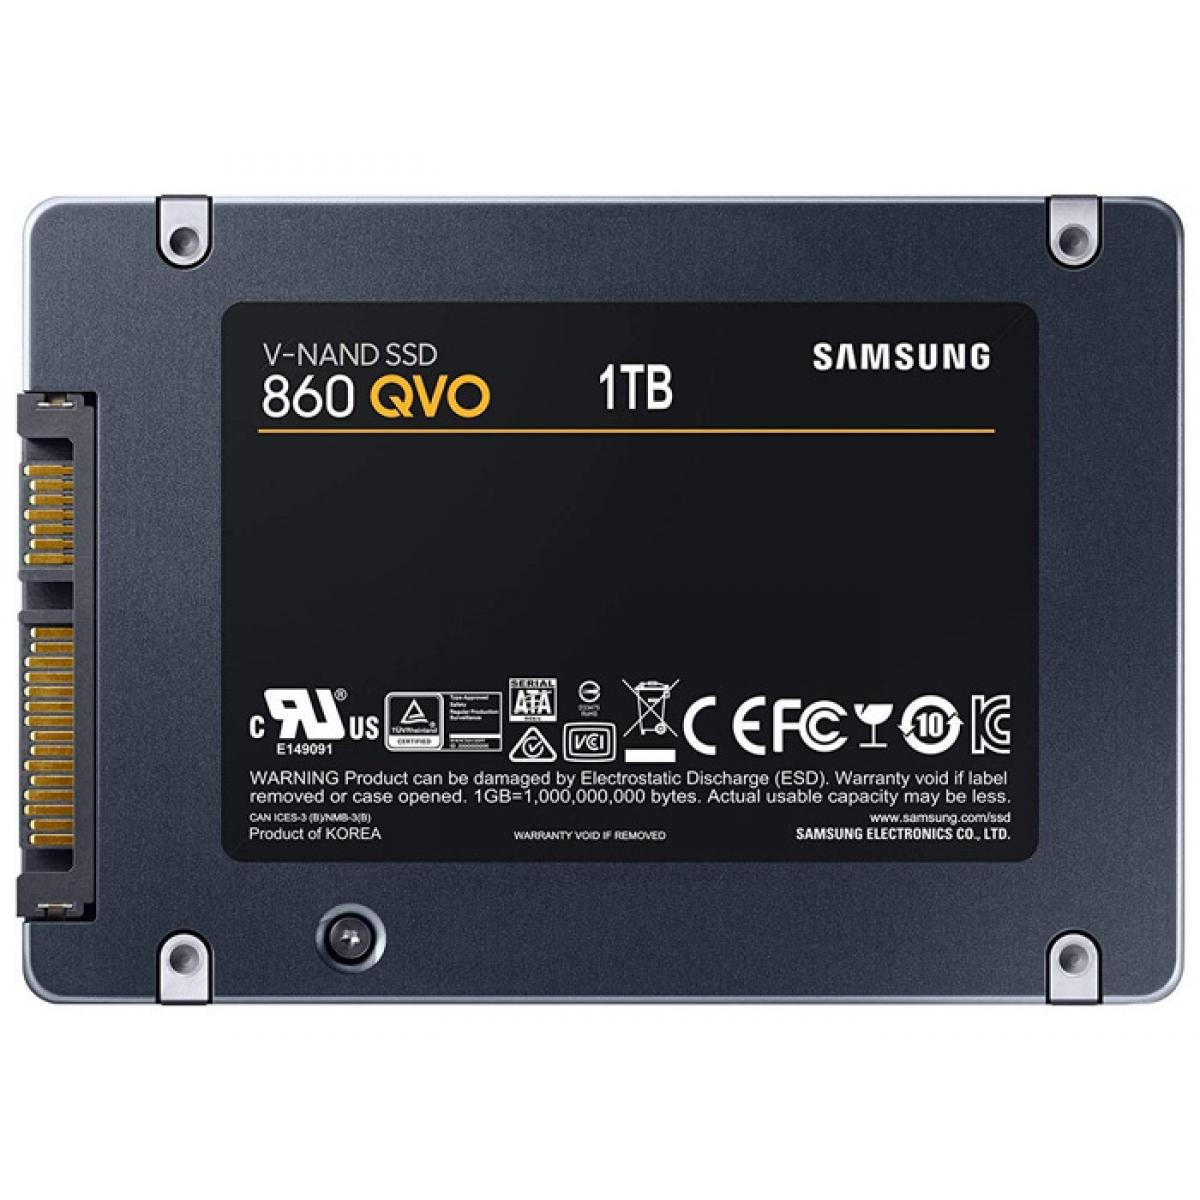 SSD Samsung 860 QVO, 1TB, Sata III, Leitura 550MBs e Gravação 520MBs, MZ-76Q1T0B-AM